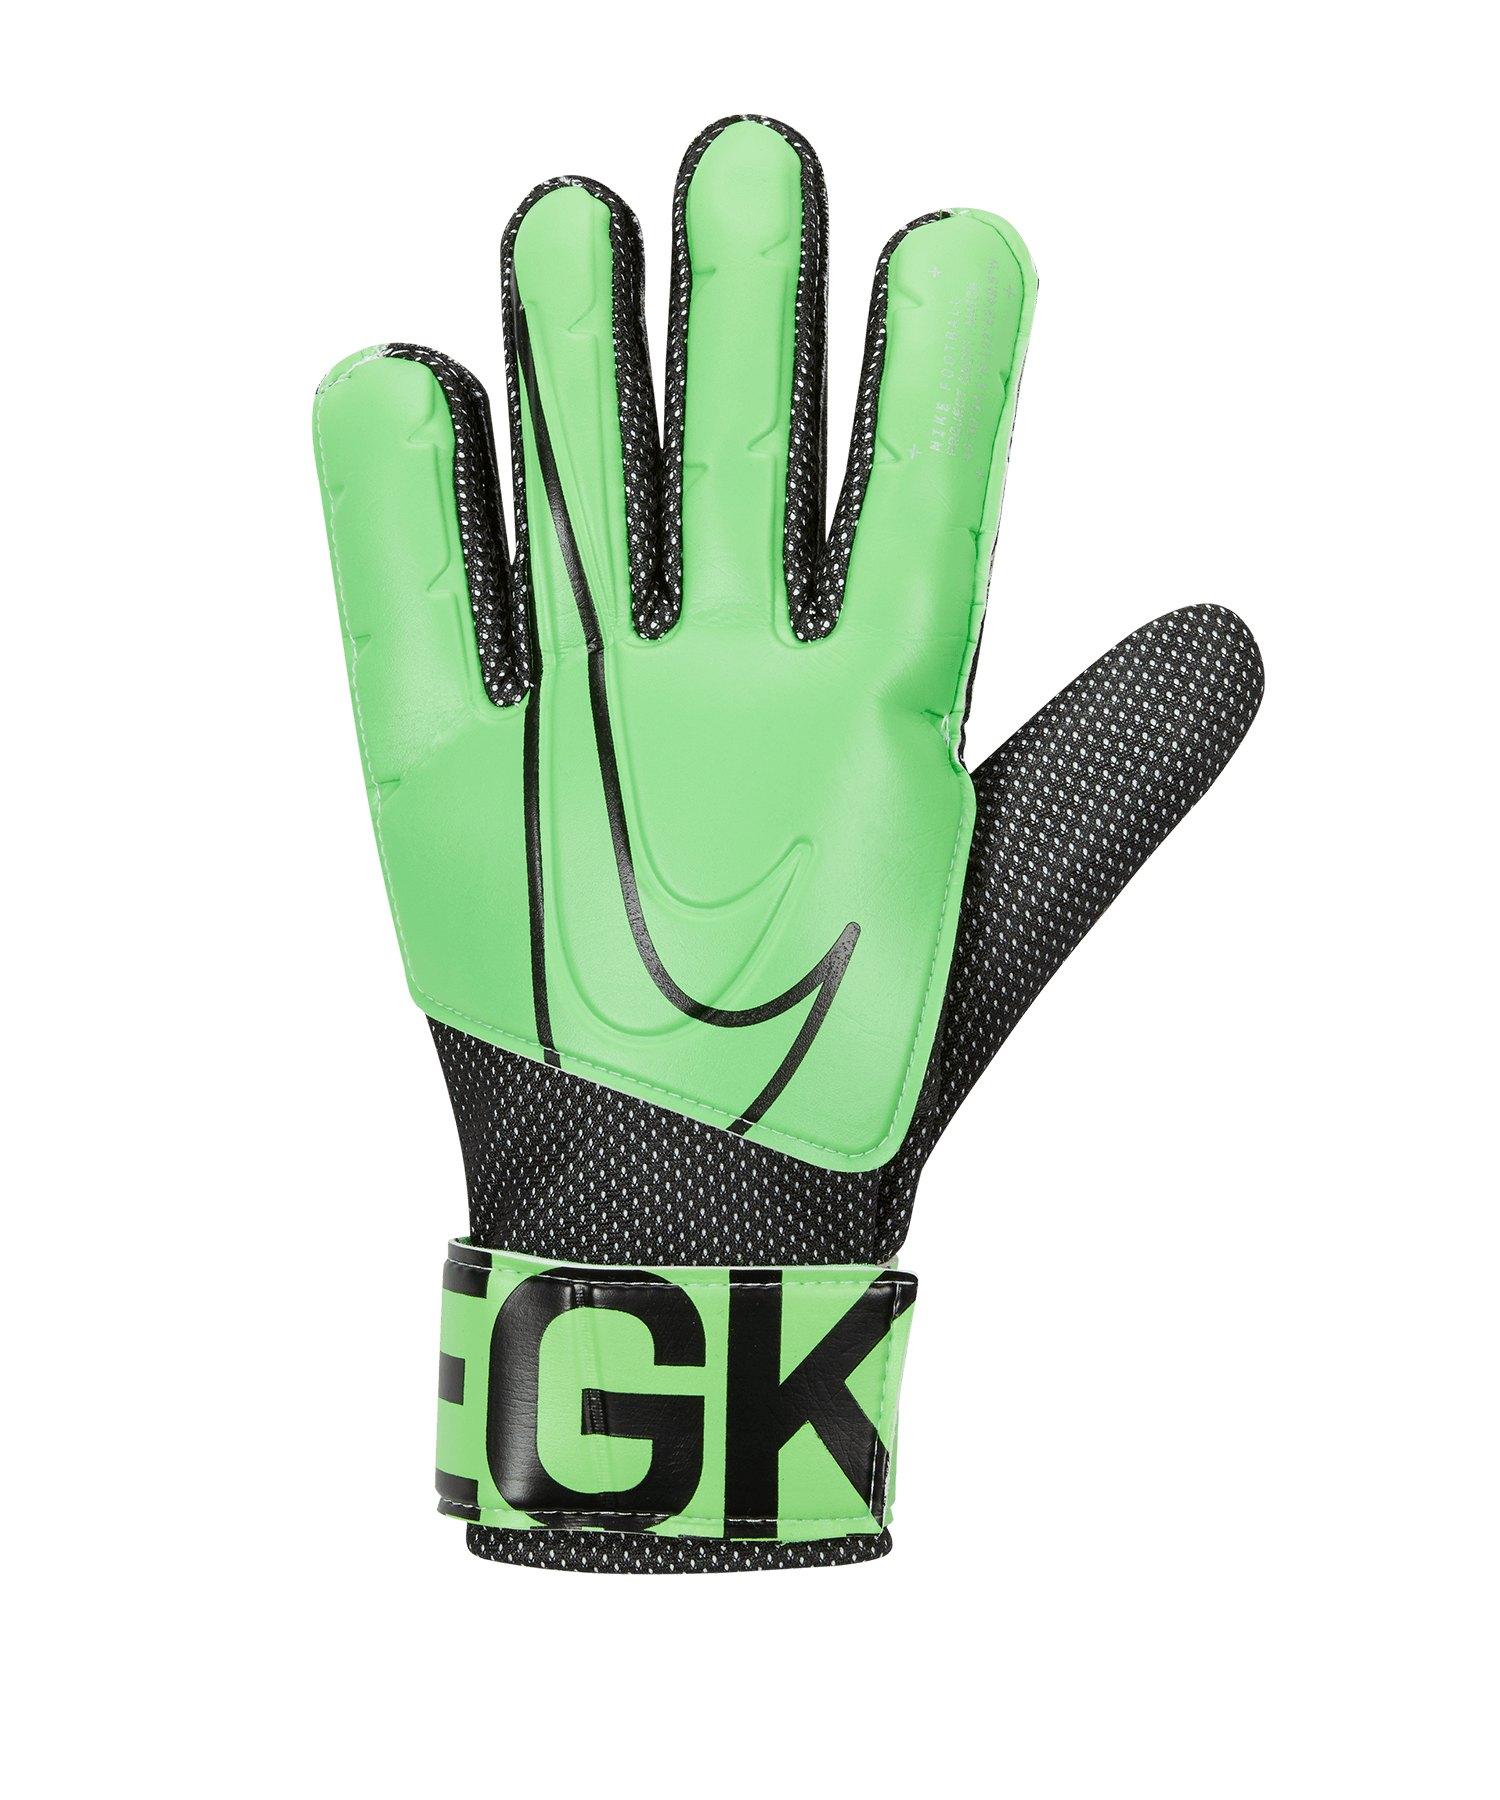 Nike Match Torwarthandschuh Grün F398 - gruen